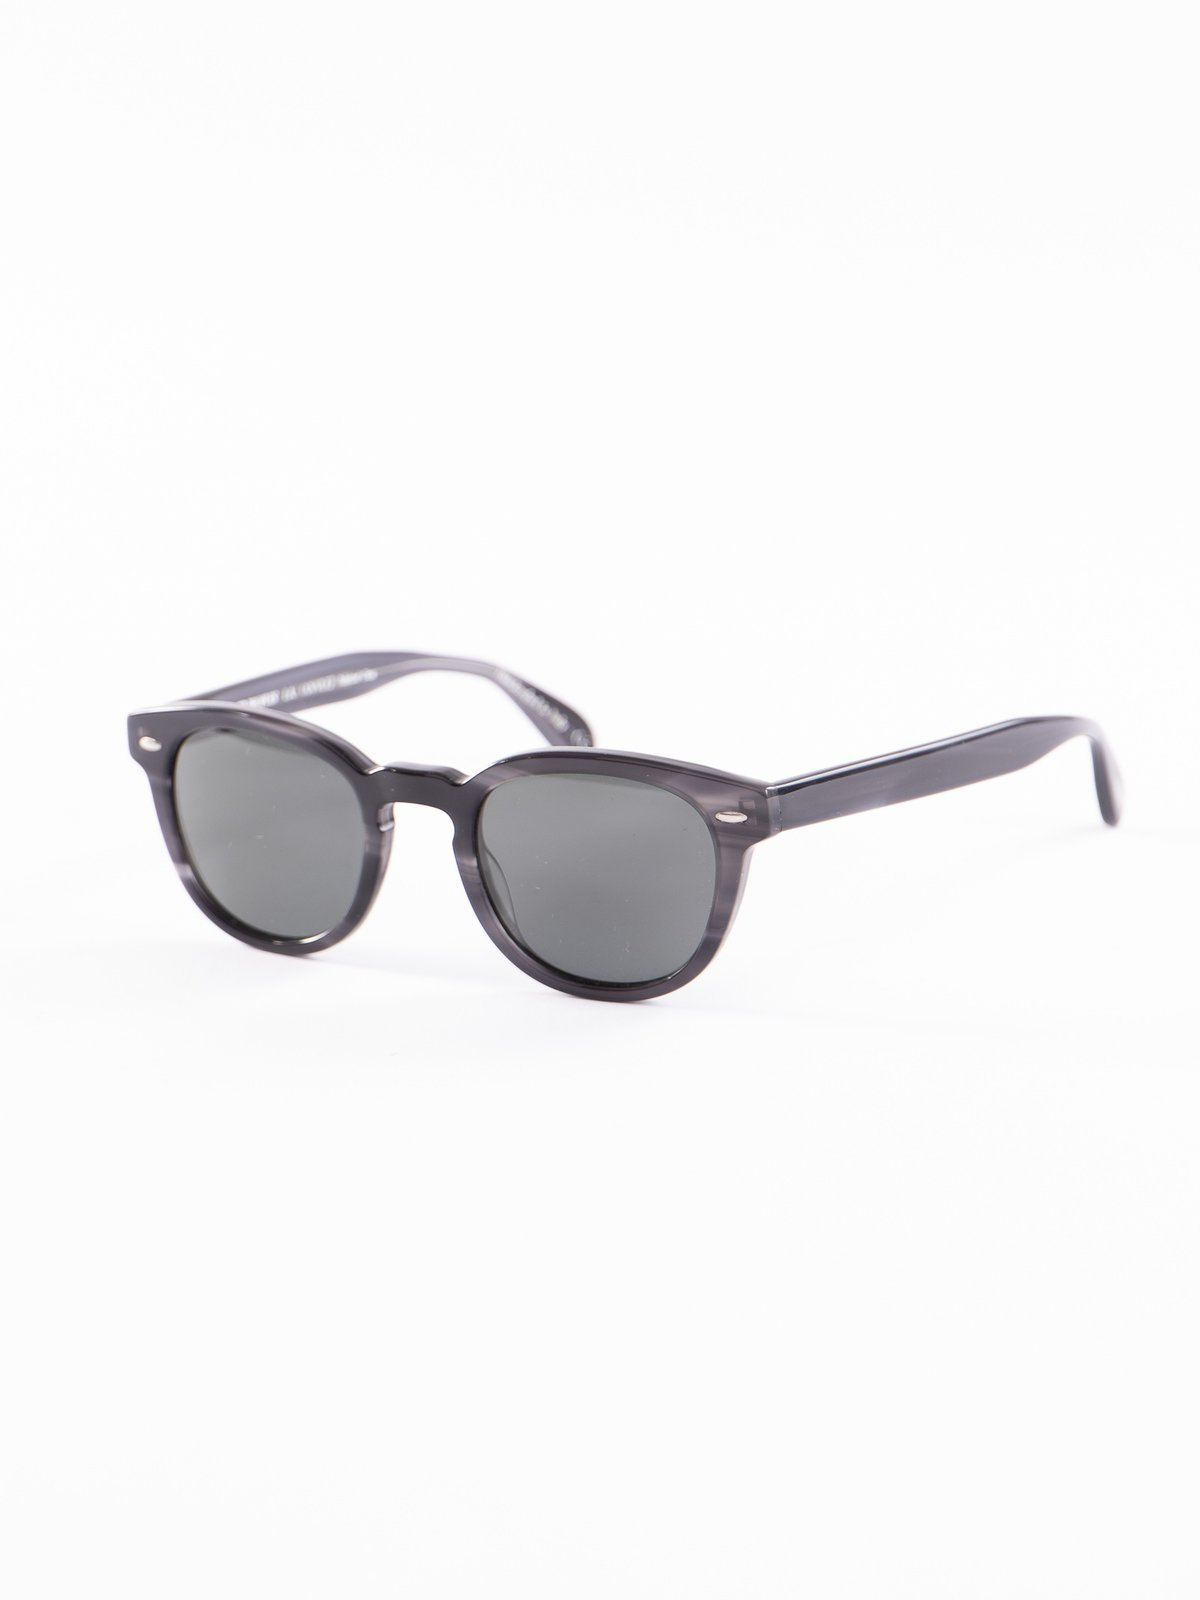 Charcoal Tortoise/Midnight Express Polar Sheldrake Sunglasses - Image 3